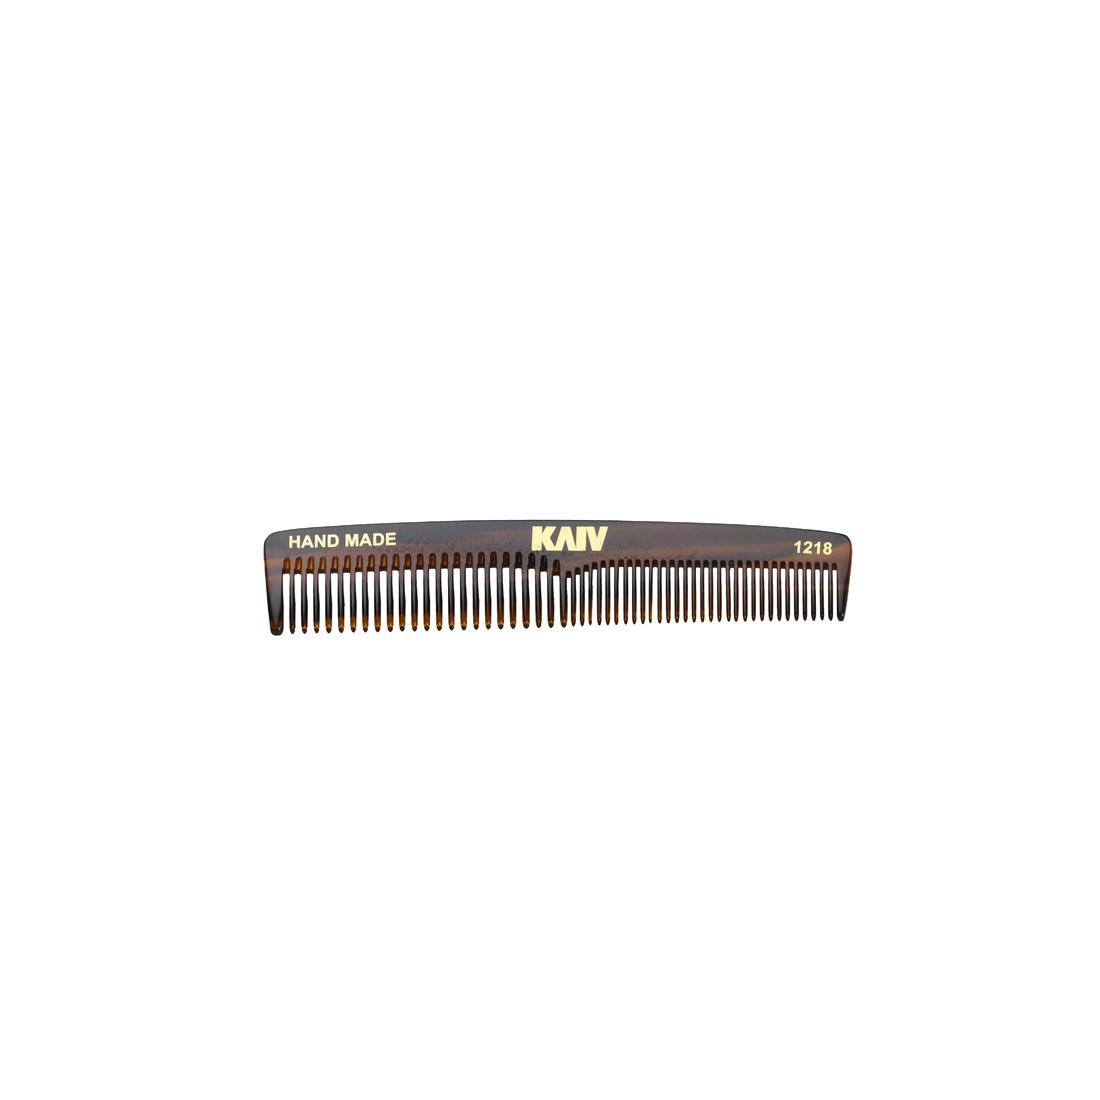 Kaiv Coarse and Half Fine Handmade Grooming Comb